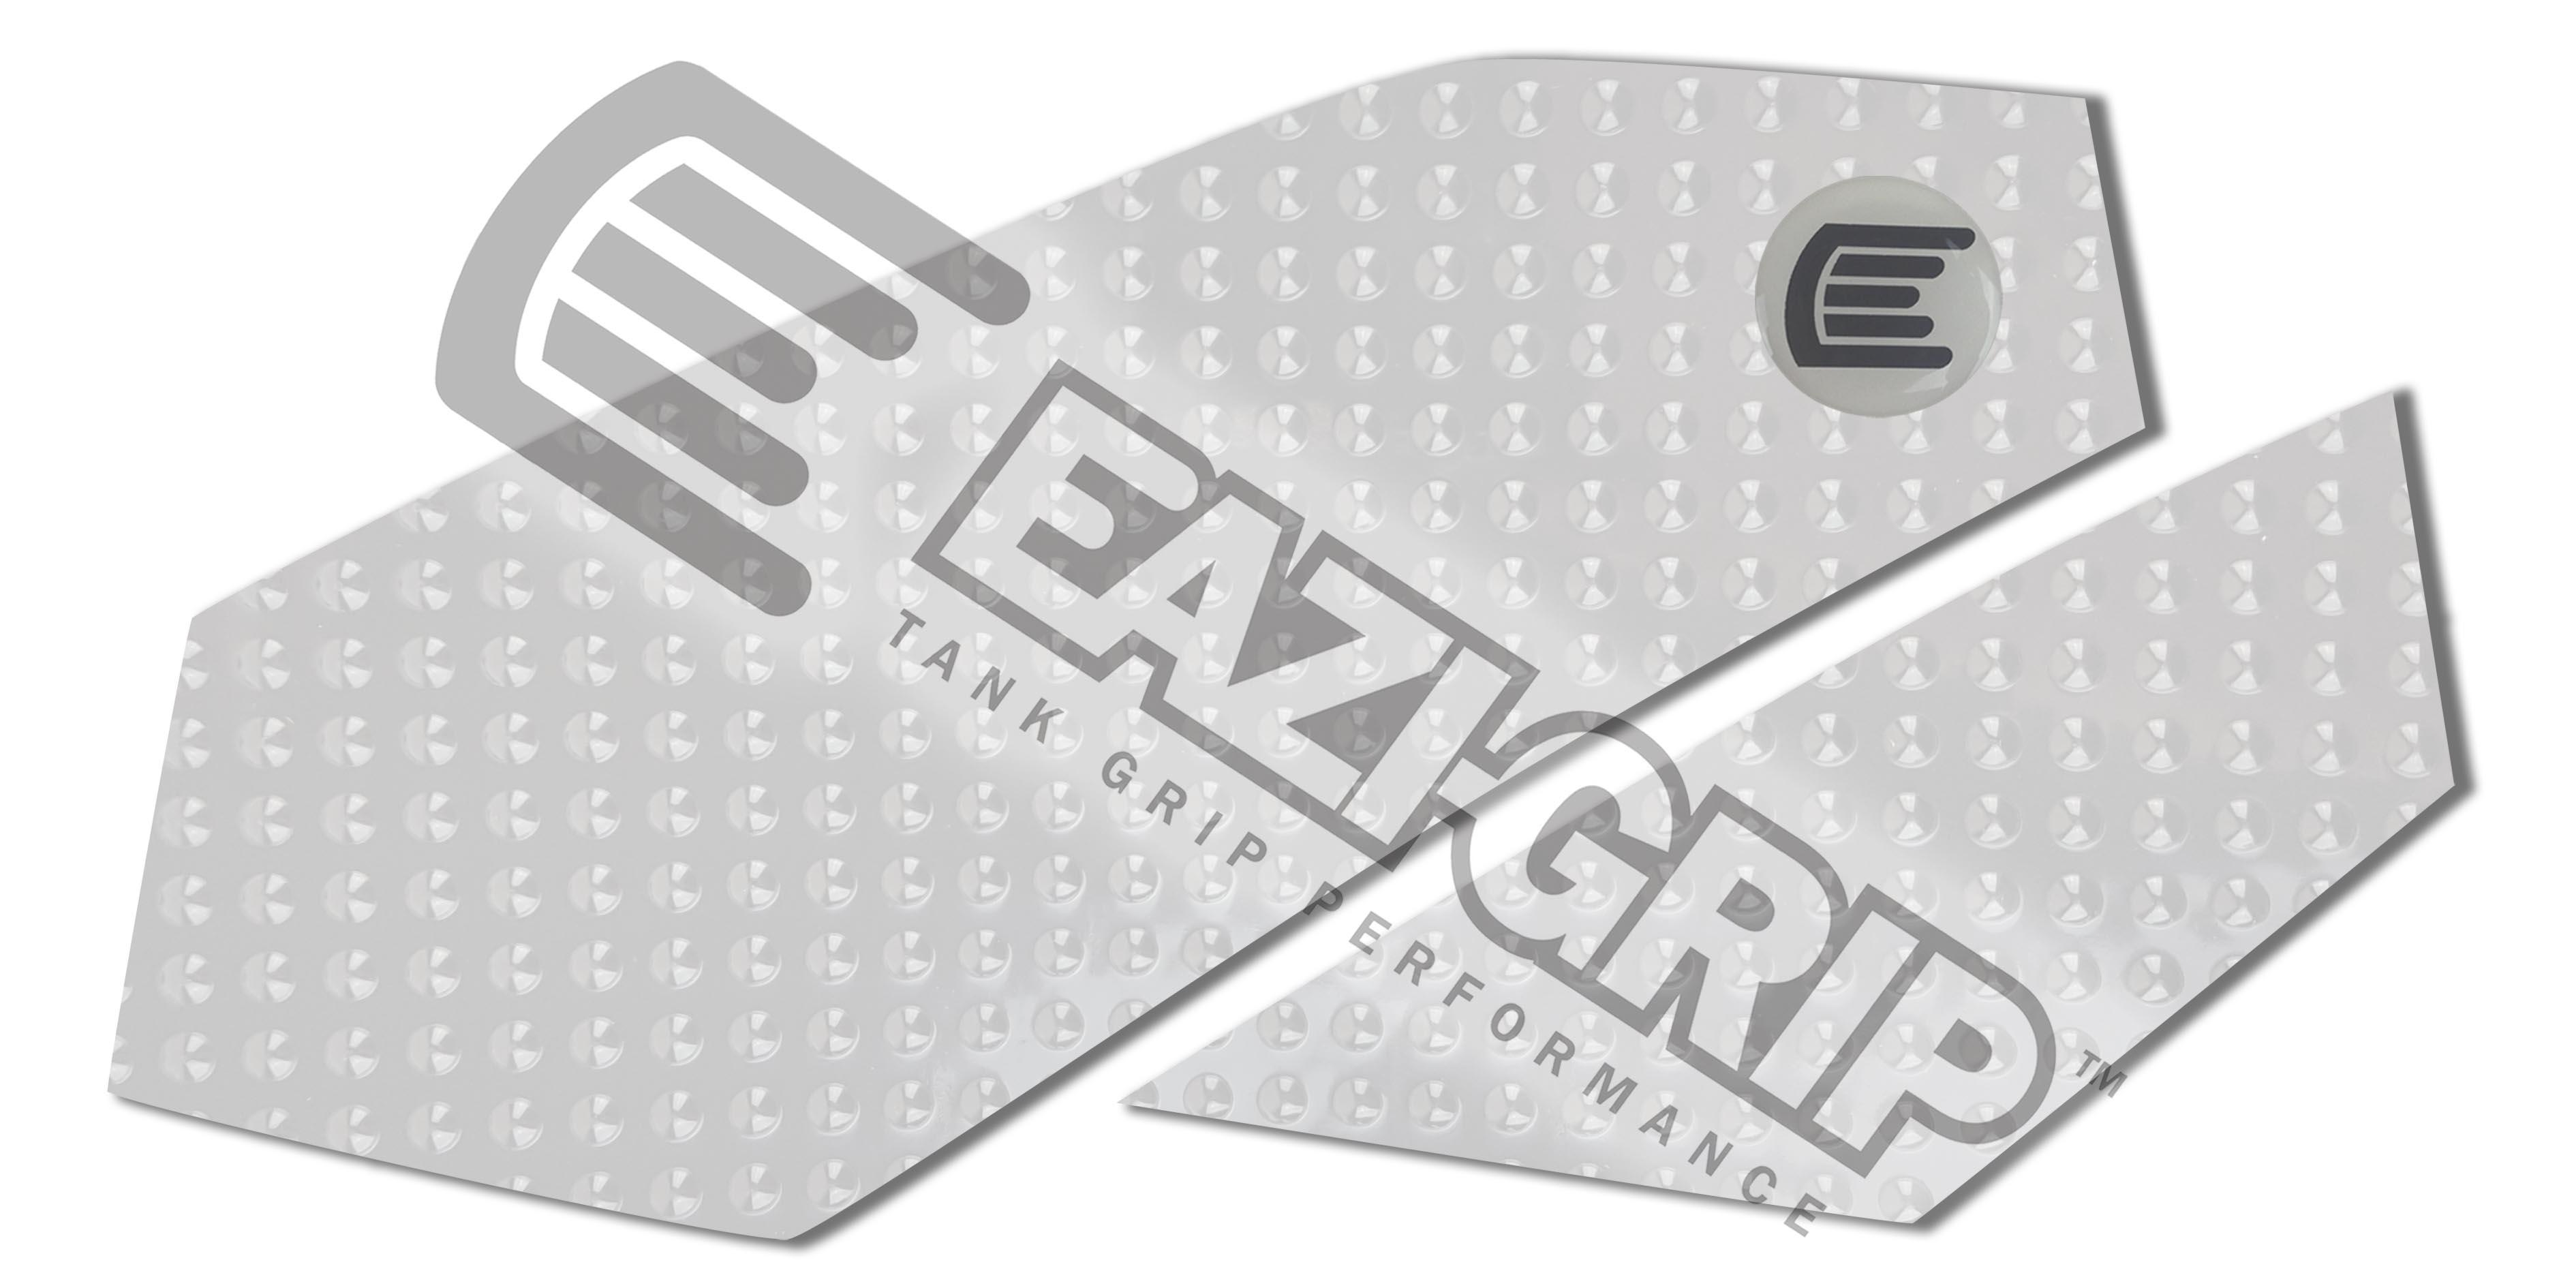 Eazi-Grip Yamaha YZF-R6 2006-2007 Clear | Eazi-Grip & Eazi-Guard